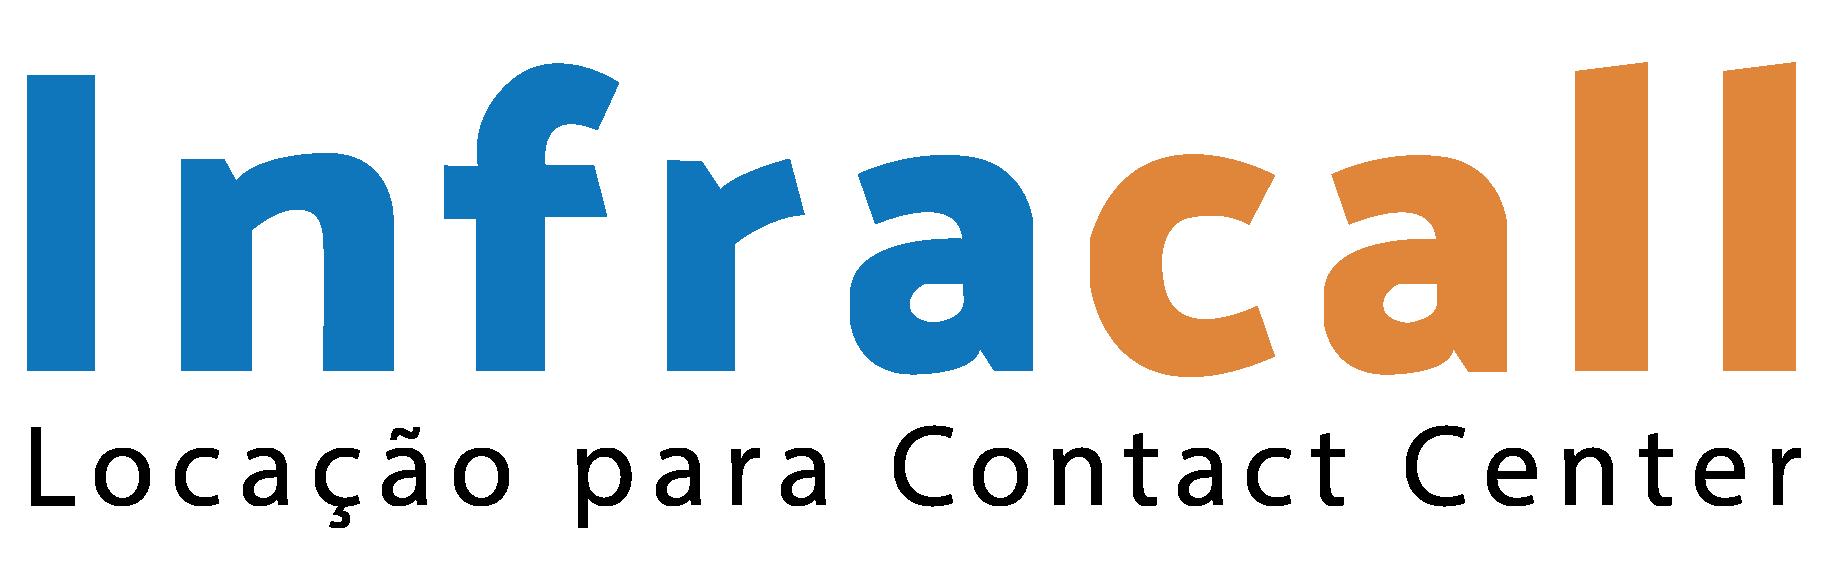 ABS_Infracall_Logotipo-01